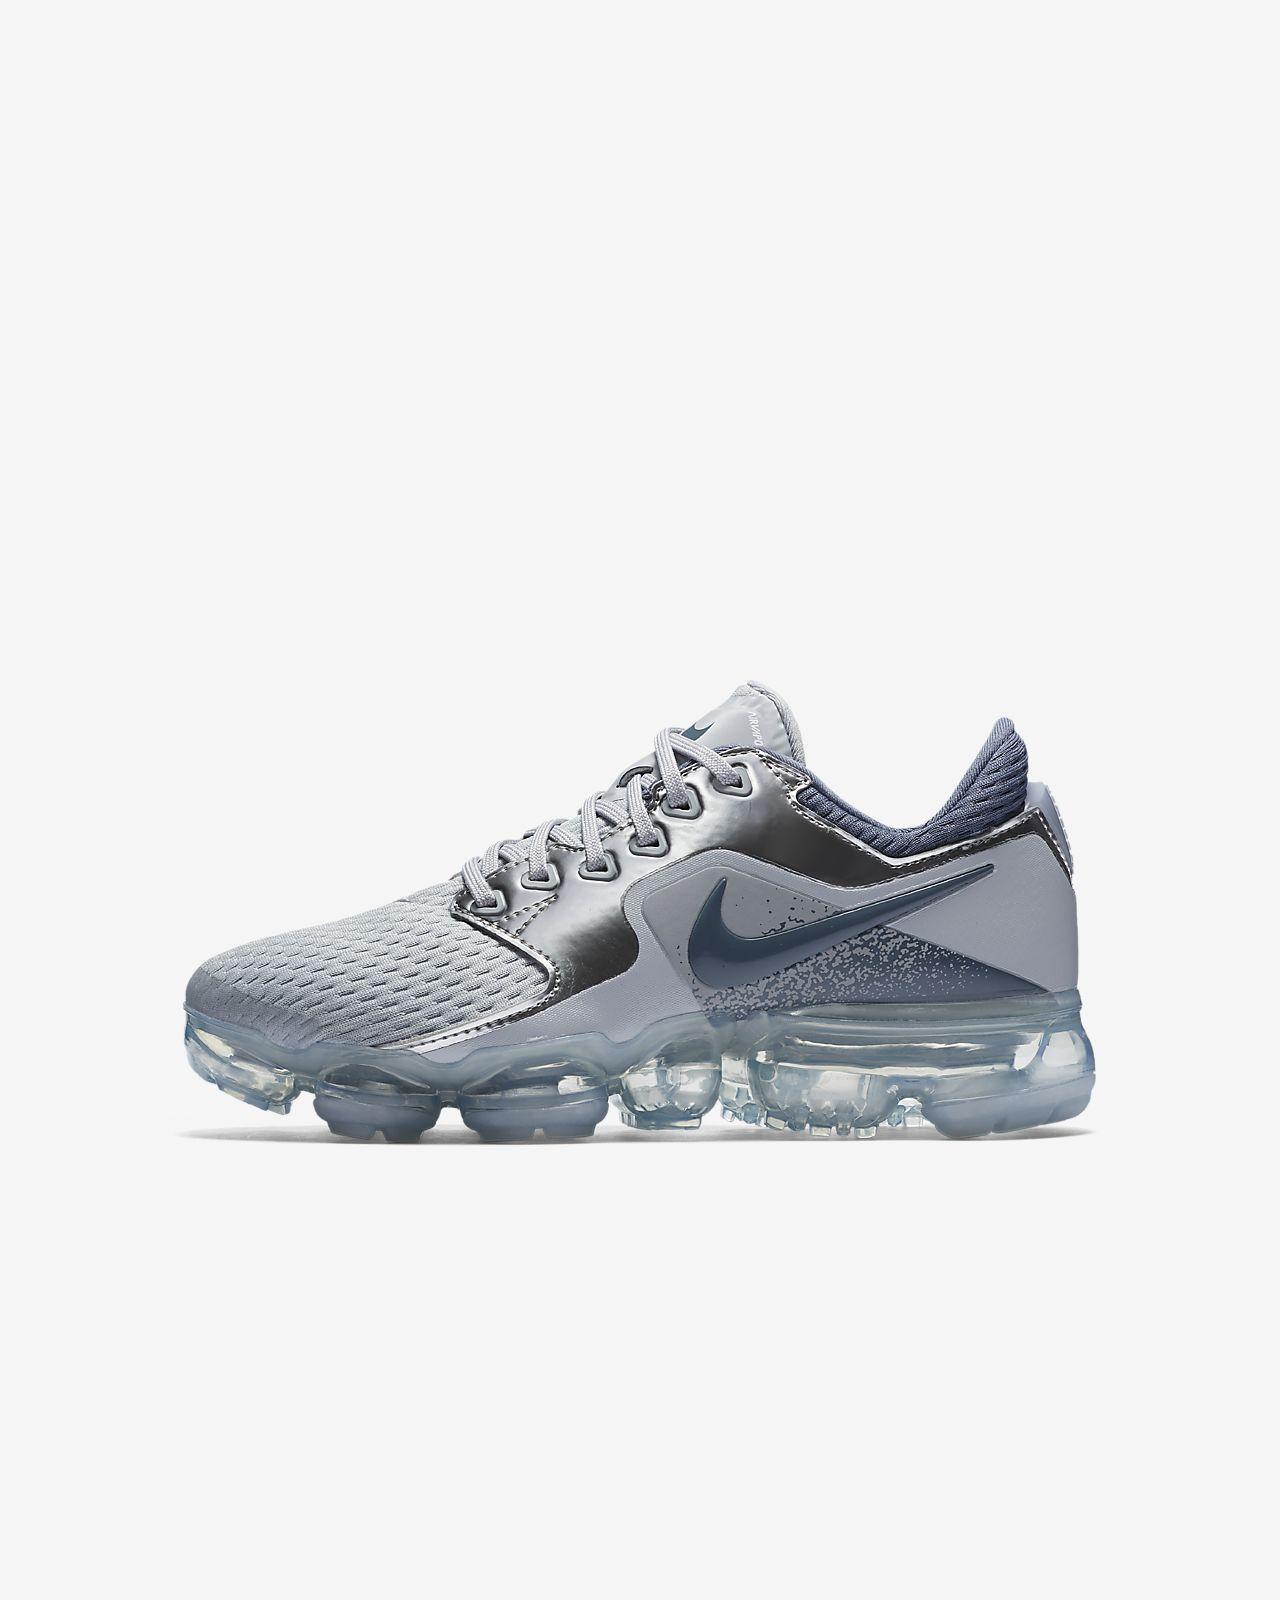 b2a5ecb3a4384 Nike Air VaporMax Big Kids  Running Shoe